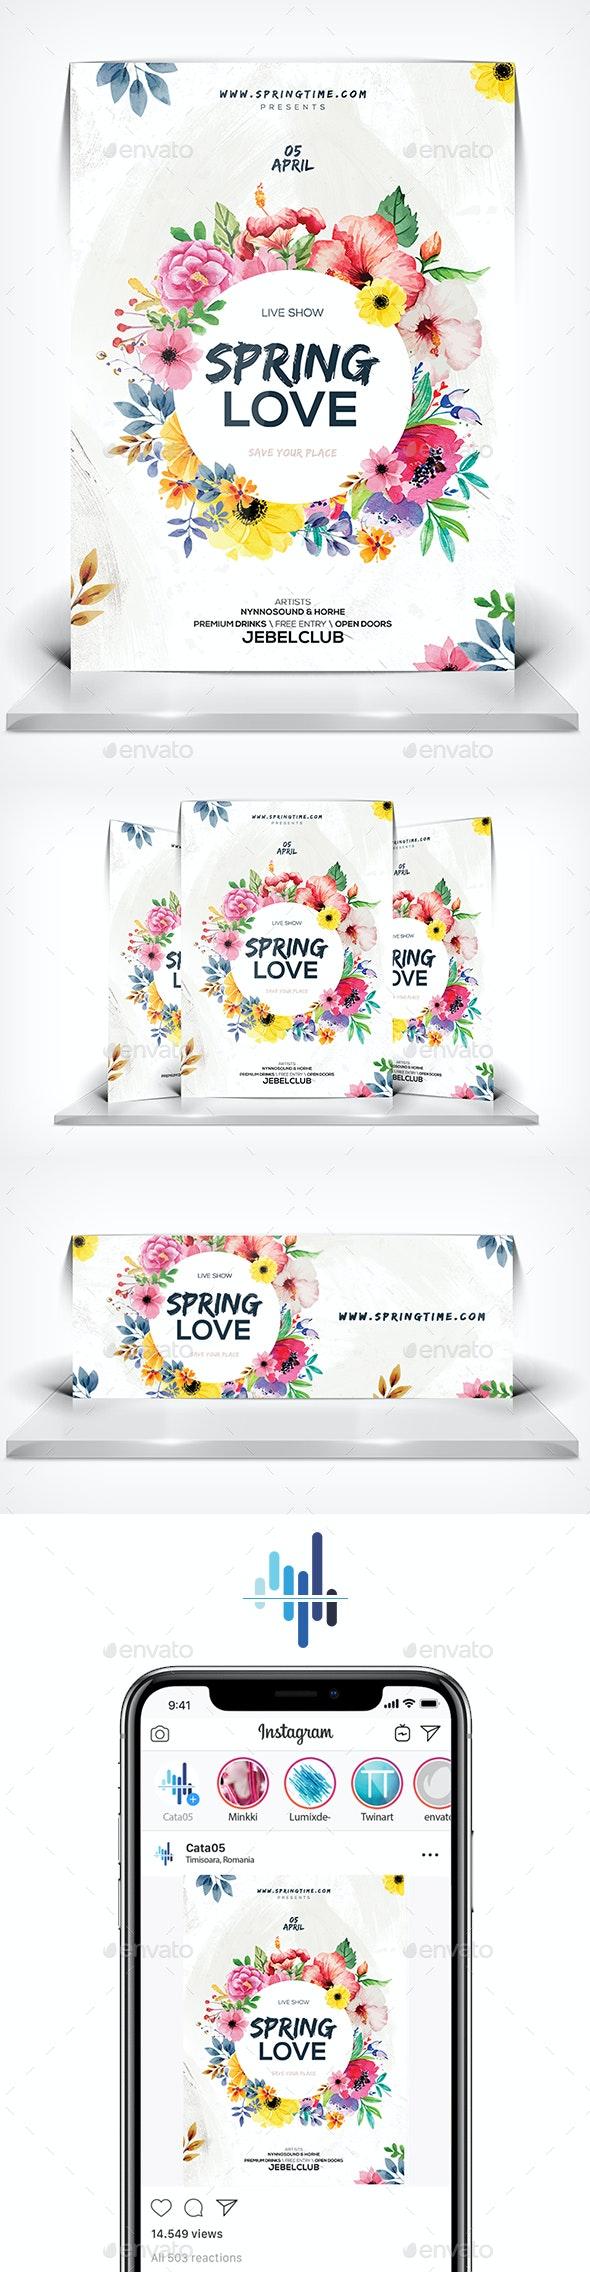 Spring Love Flyer - Flyers Print Templates